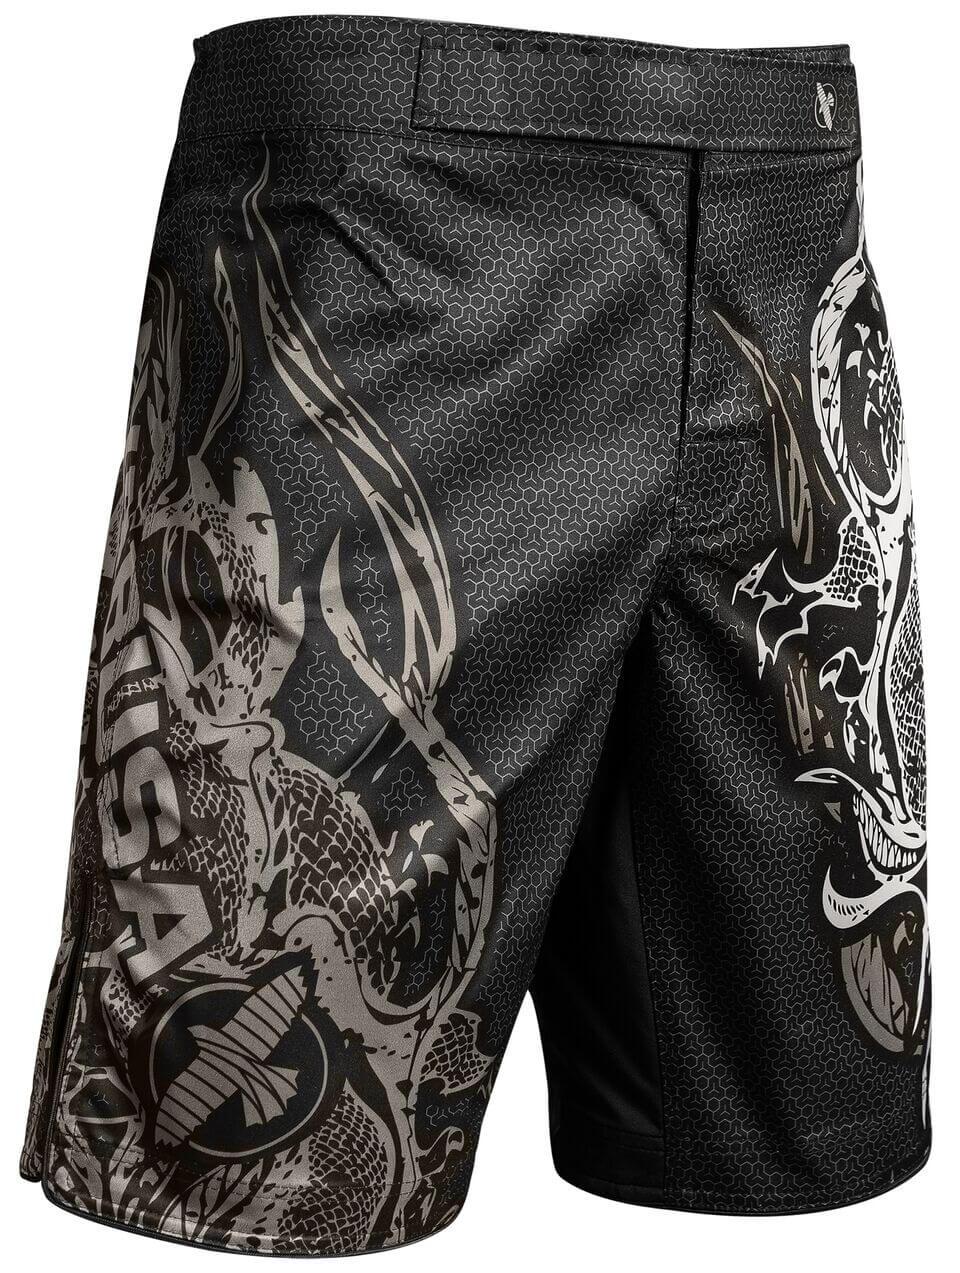 Mizuchi shorts